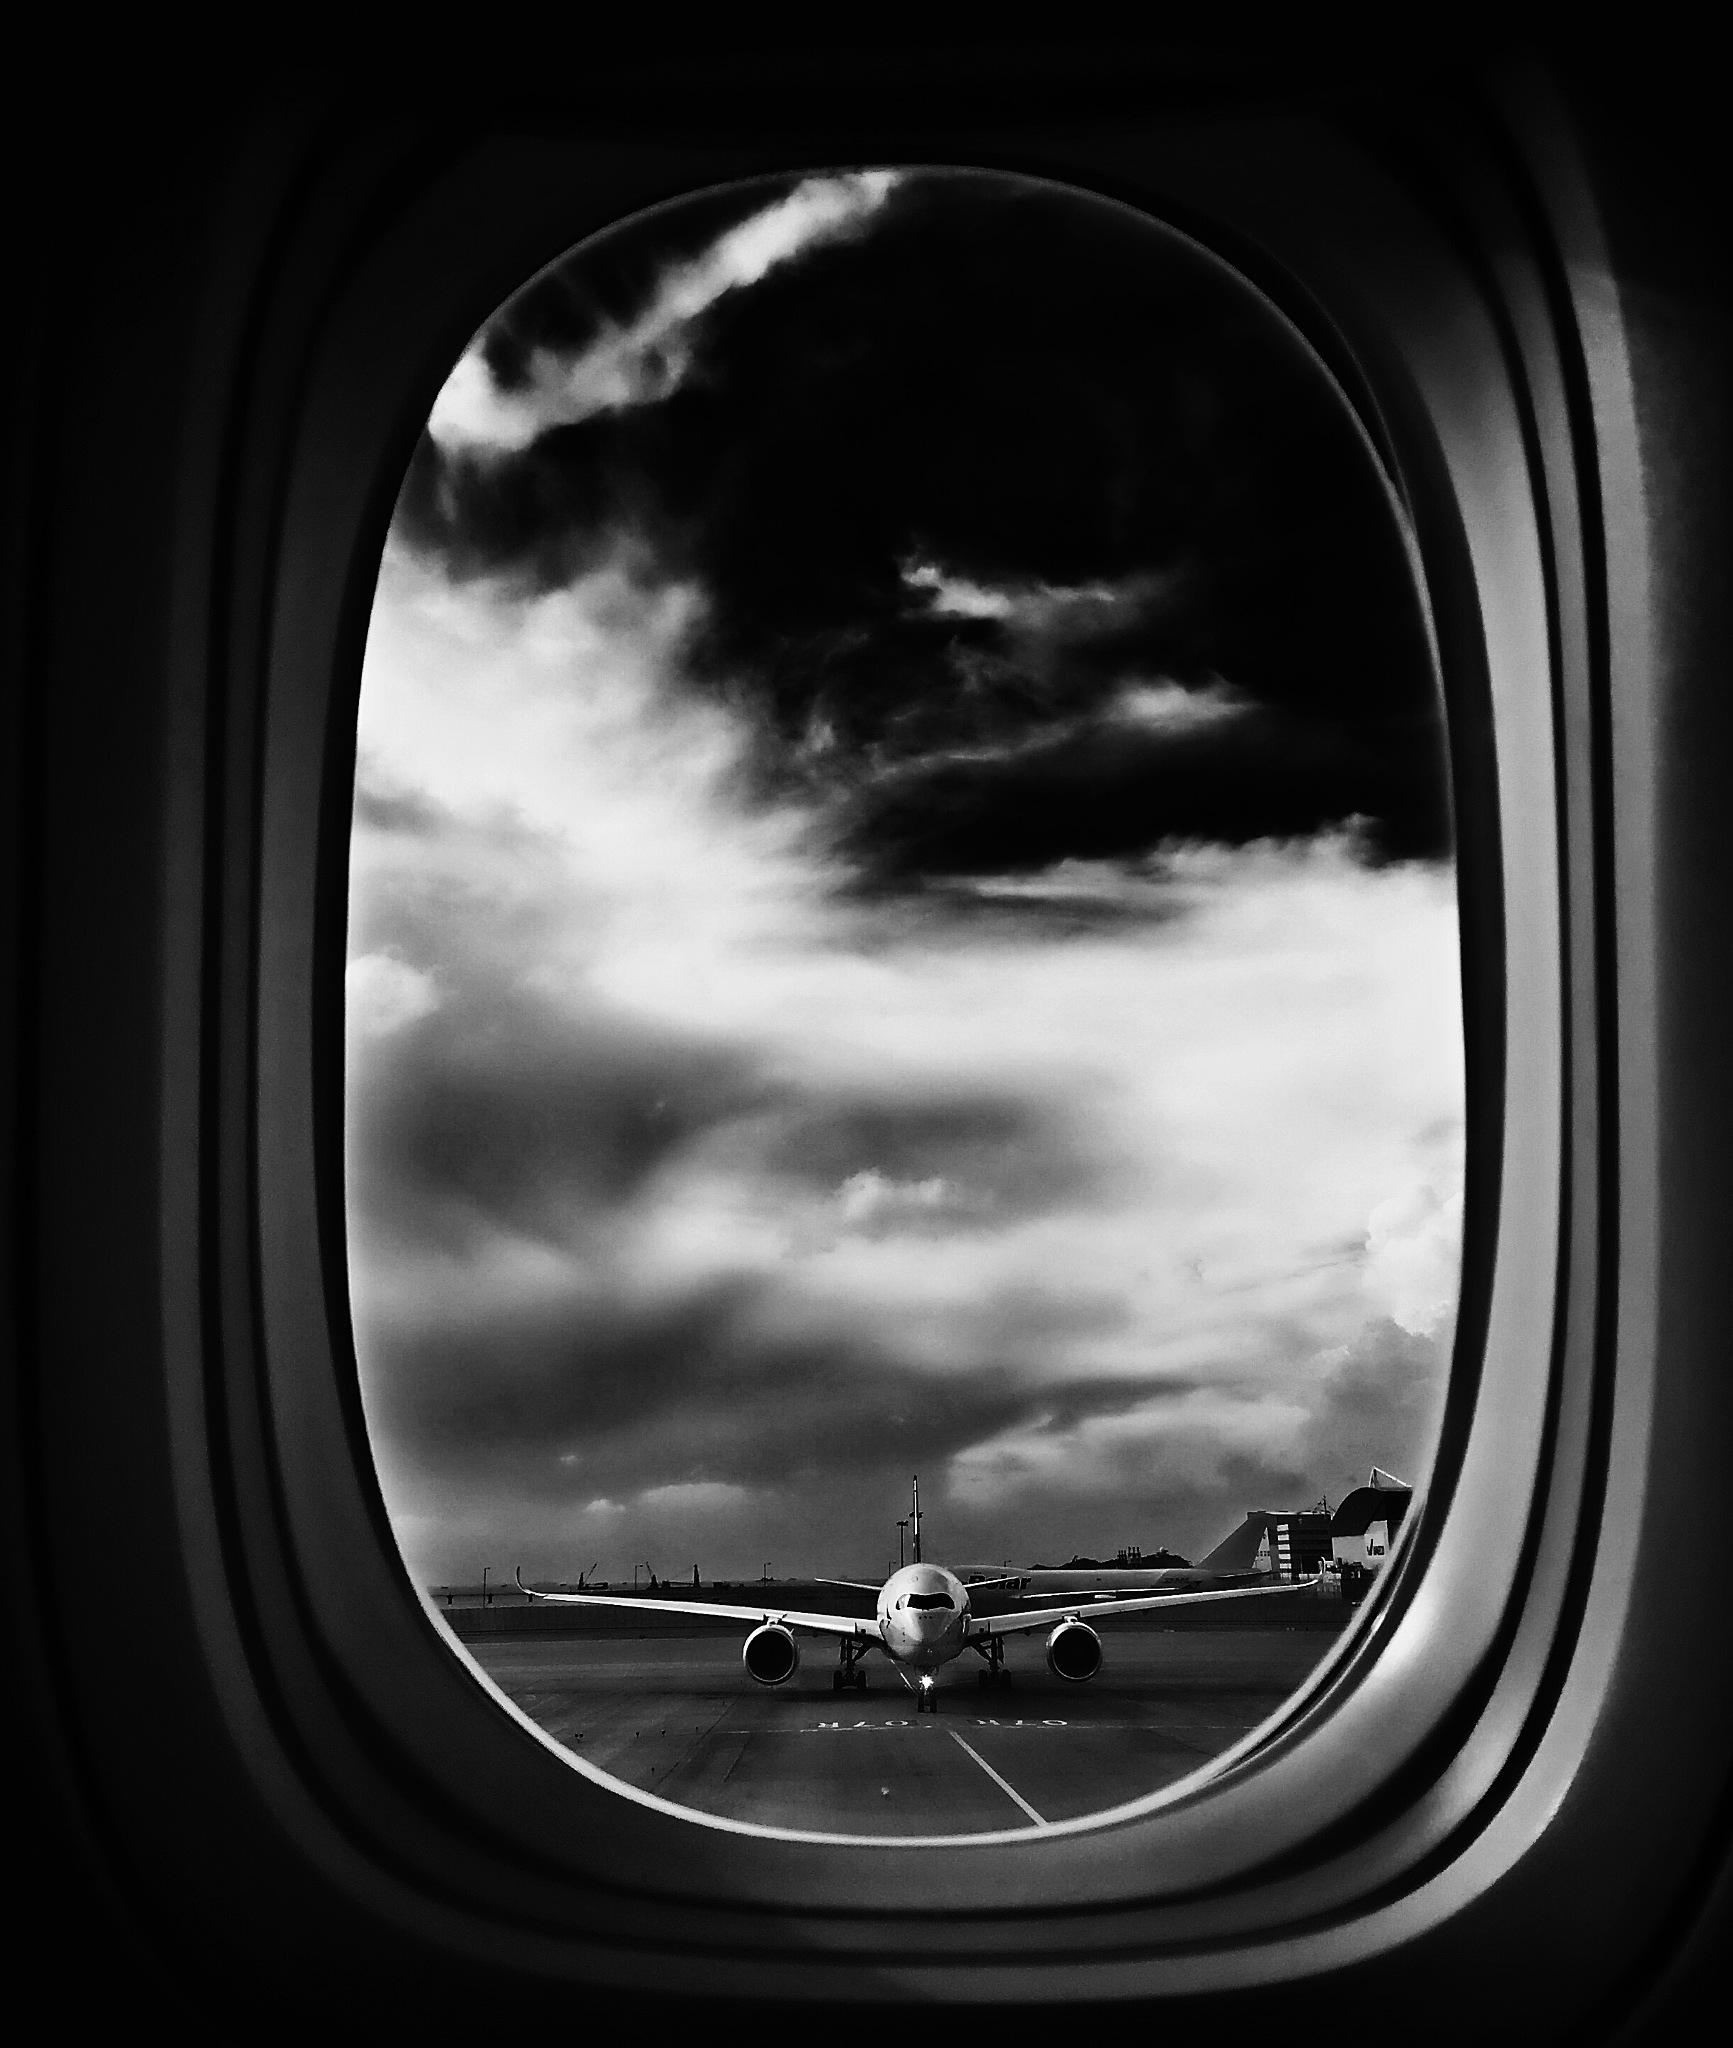 Evening flight by XQMe